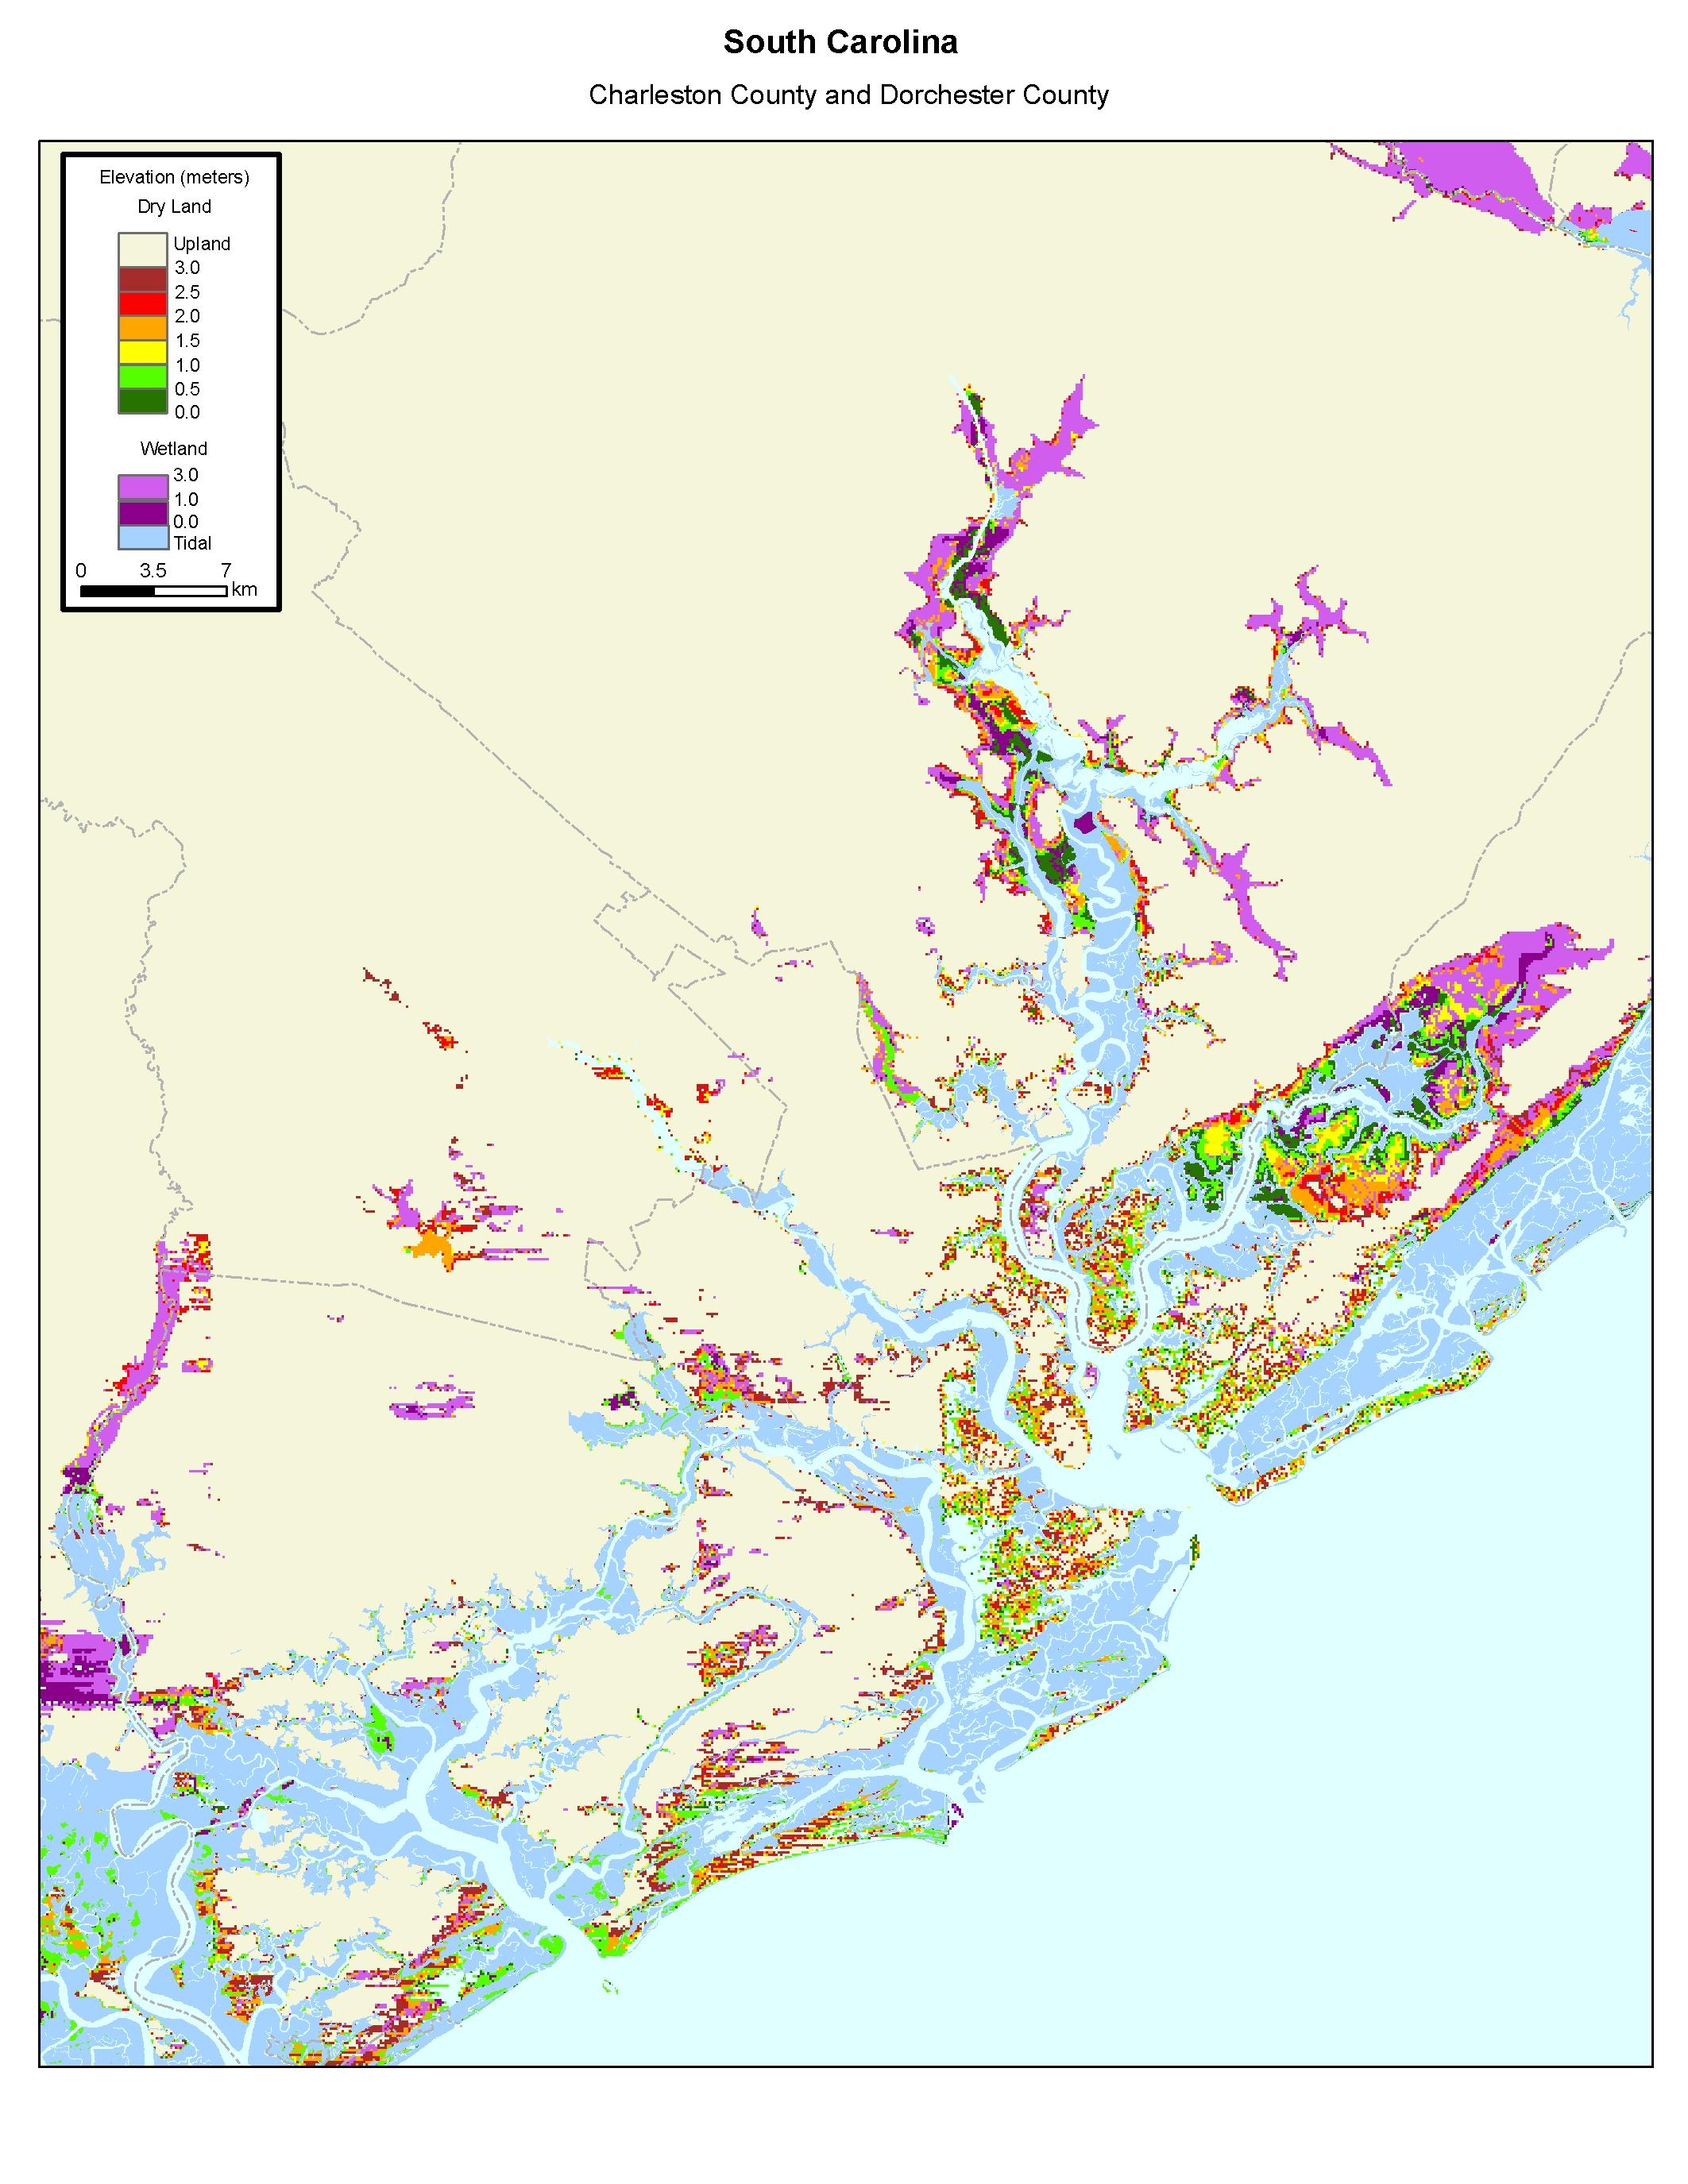 More Sea Level Rise Maps Of South Carolina - South carolina elevation map